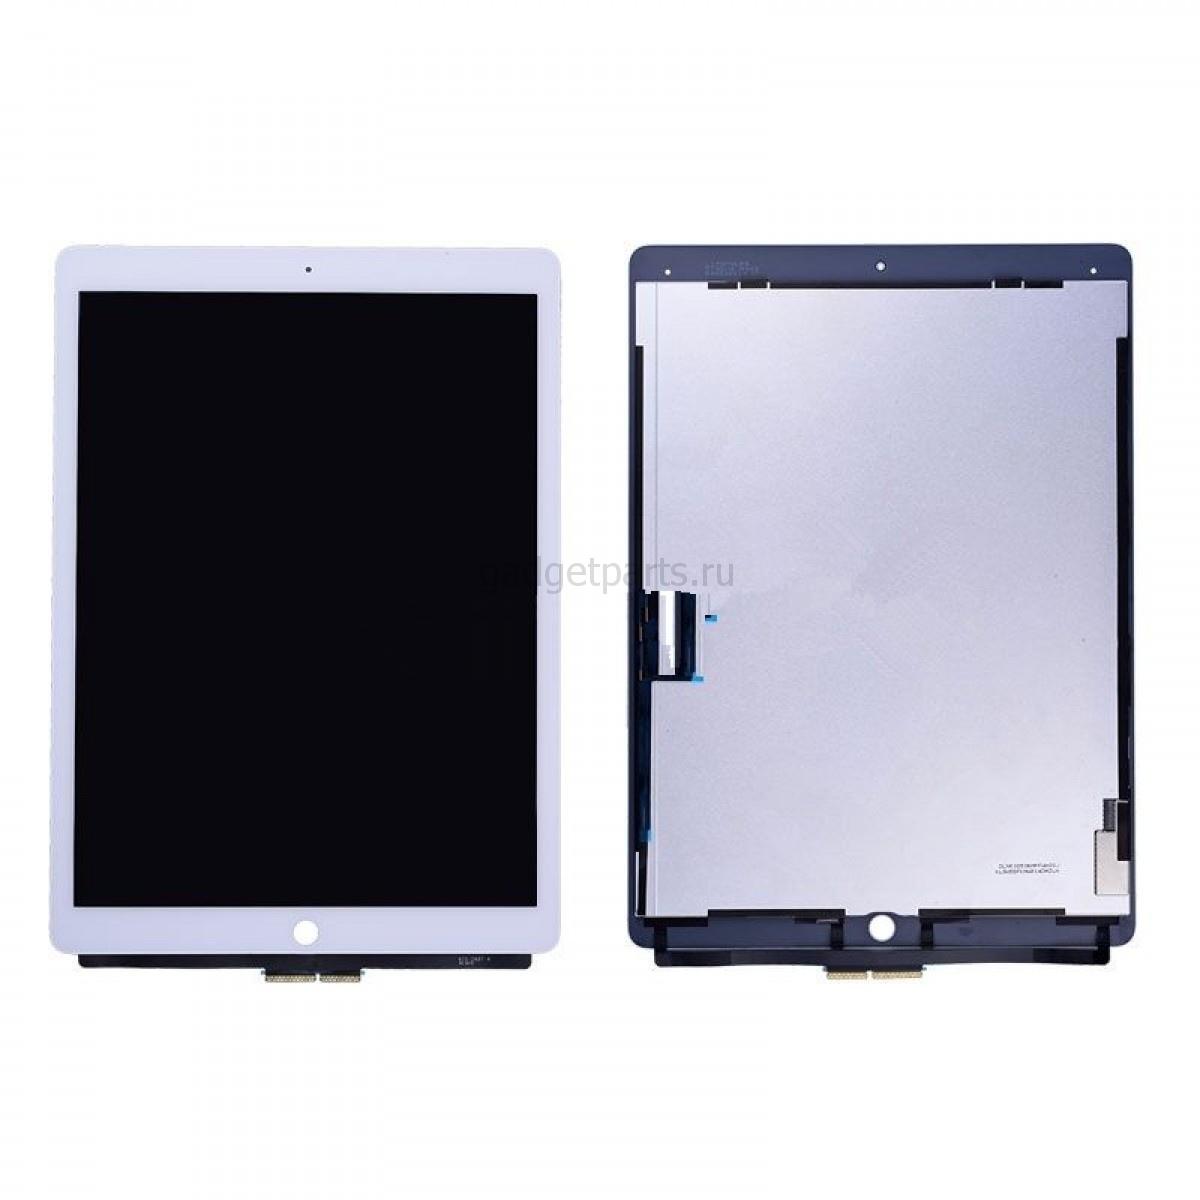 "Модуль (дисплей, тачскрин) iPad Pro 9,7"" Белый (White)"